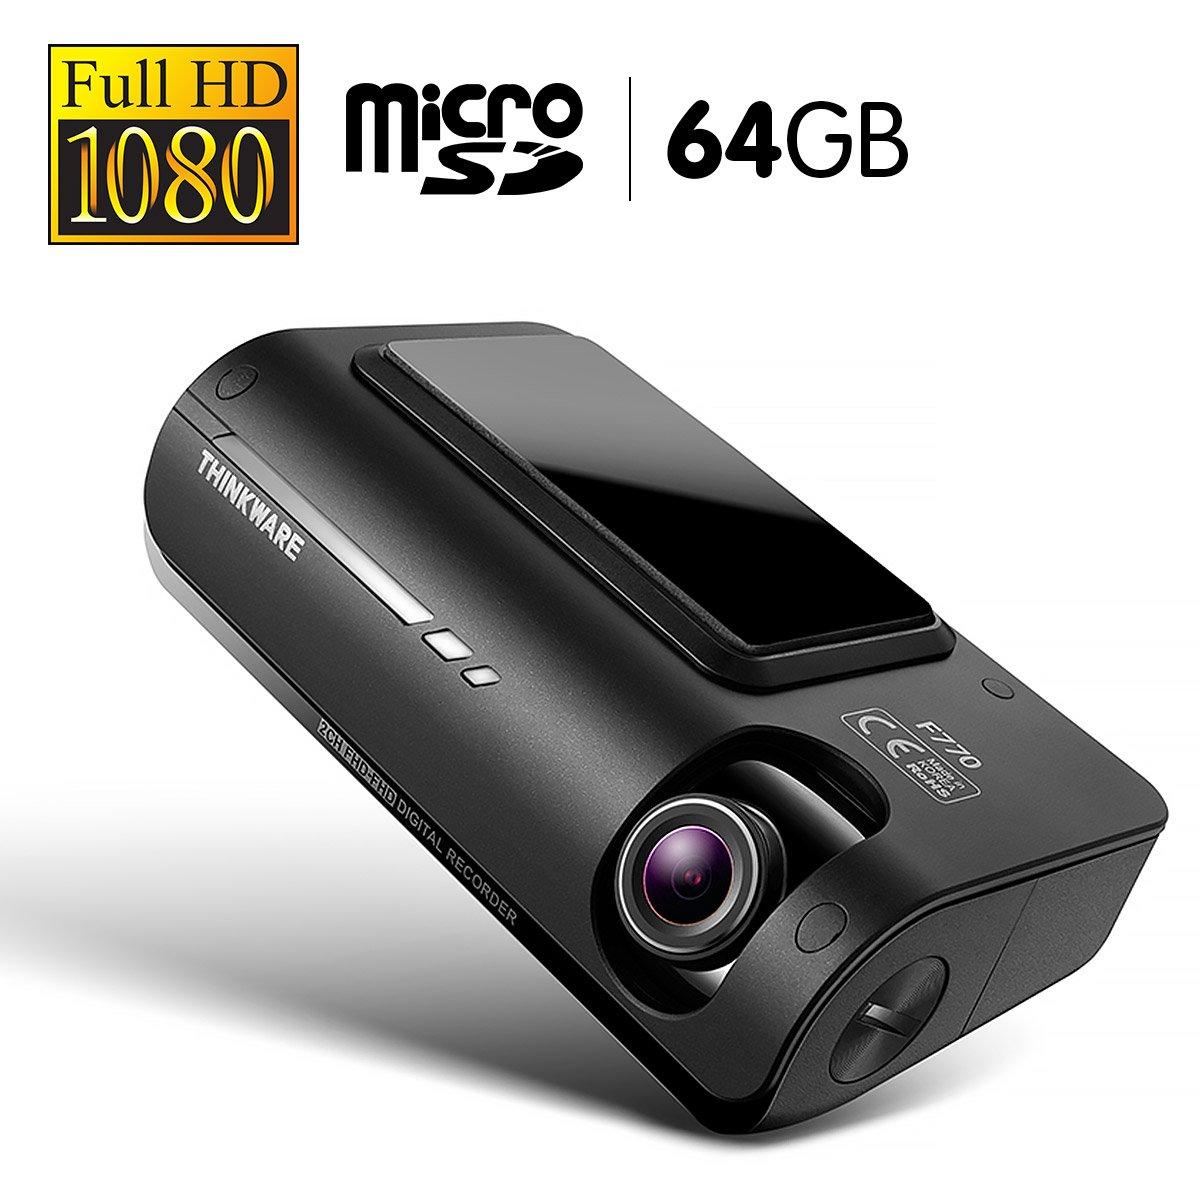 THINKWARE 1080P Full HD Dash Cam With 64GB Micro SD - F77064